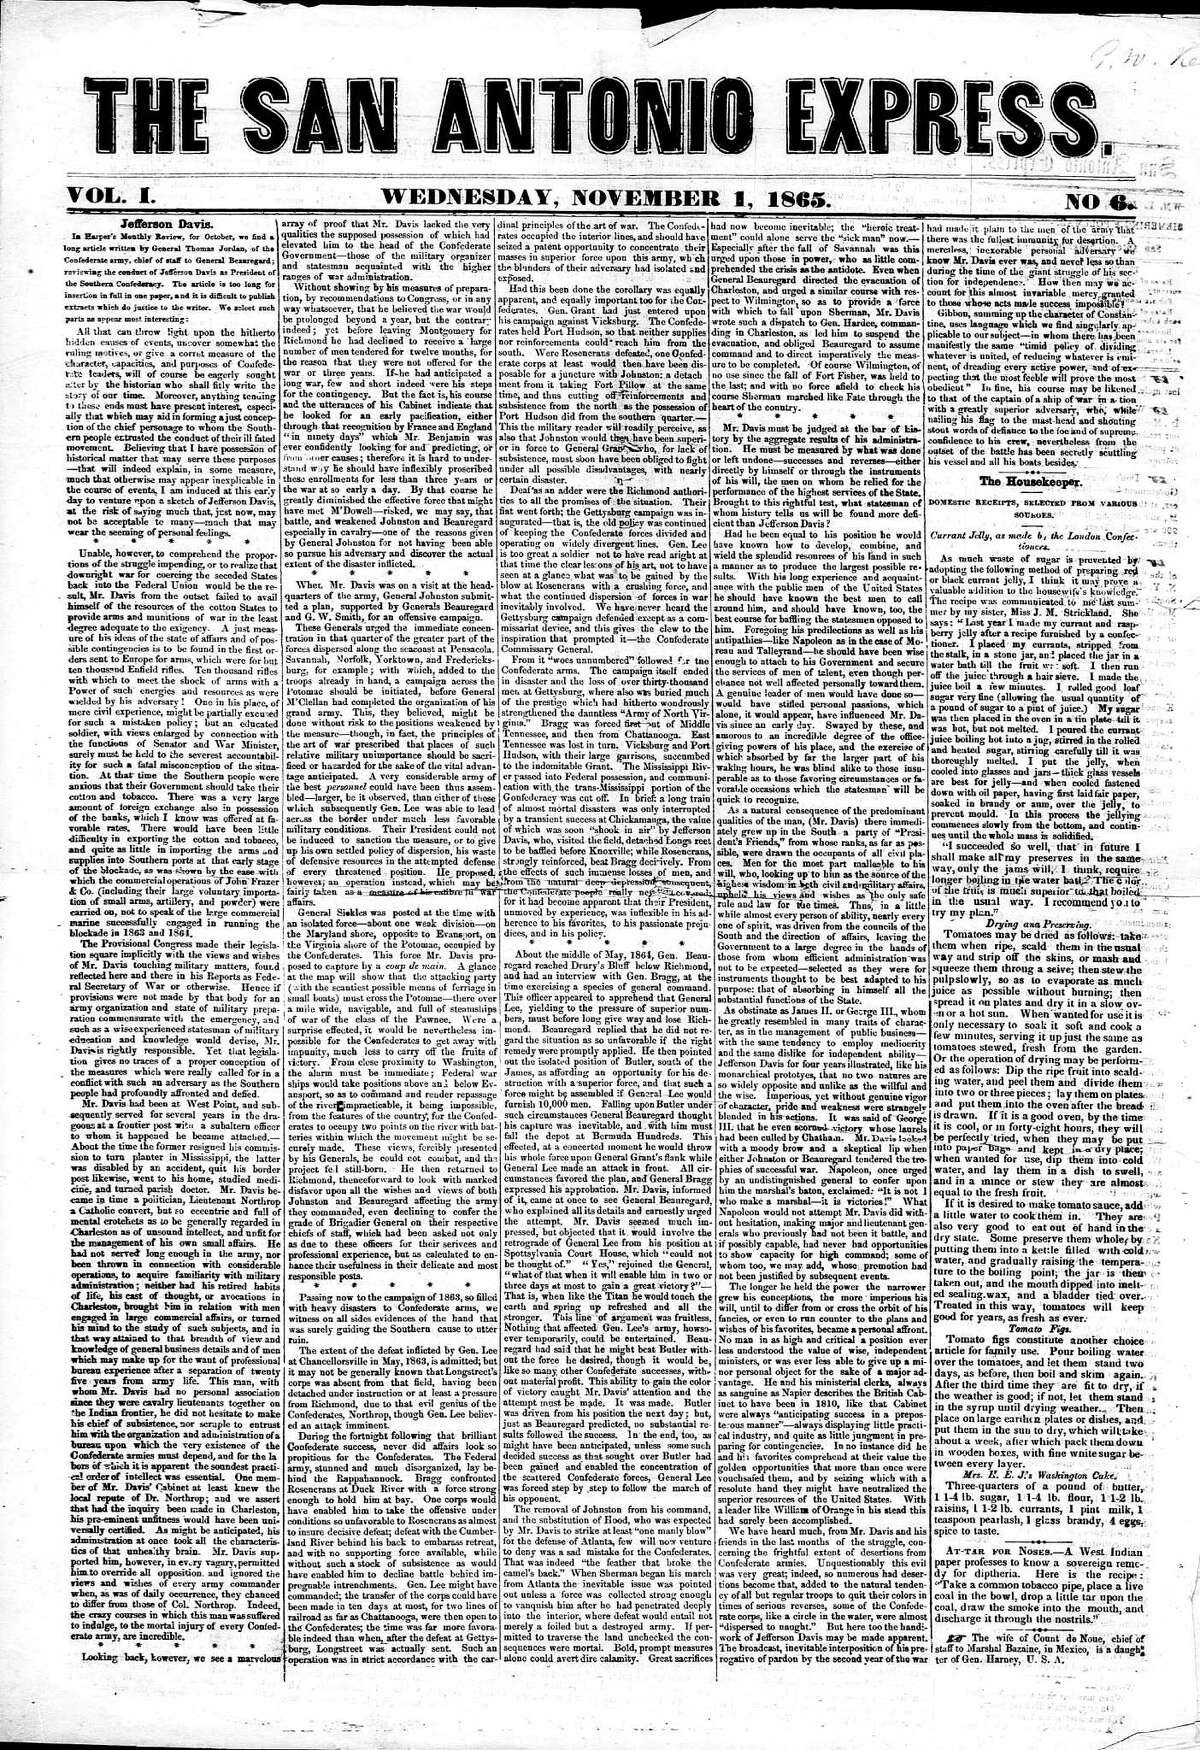 Nov. 1, 1865